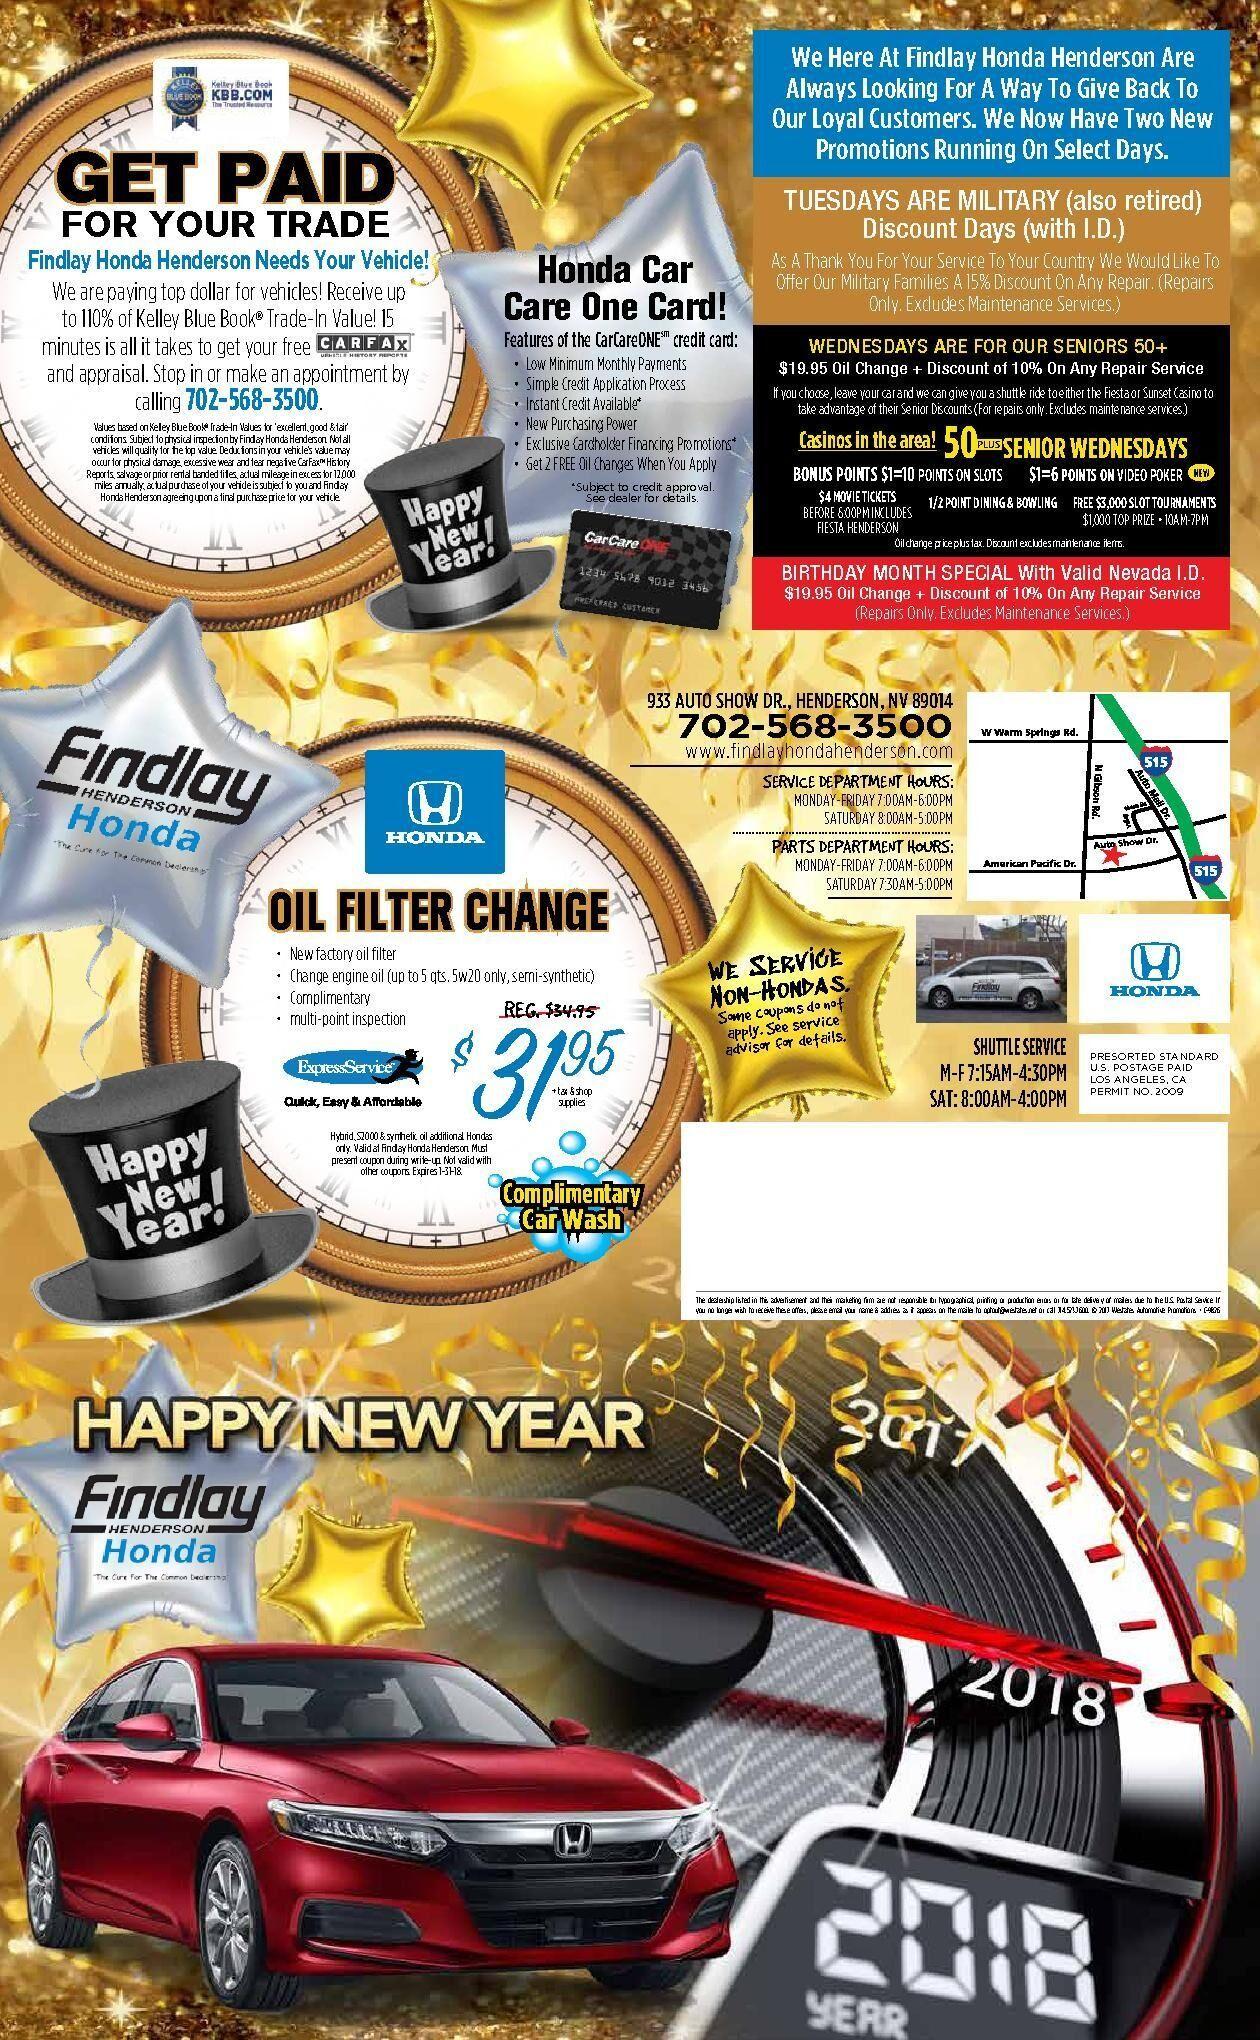 Findlay Honda Henderson New Year